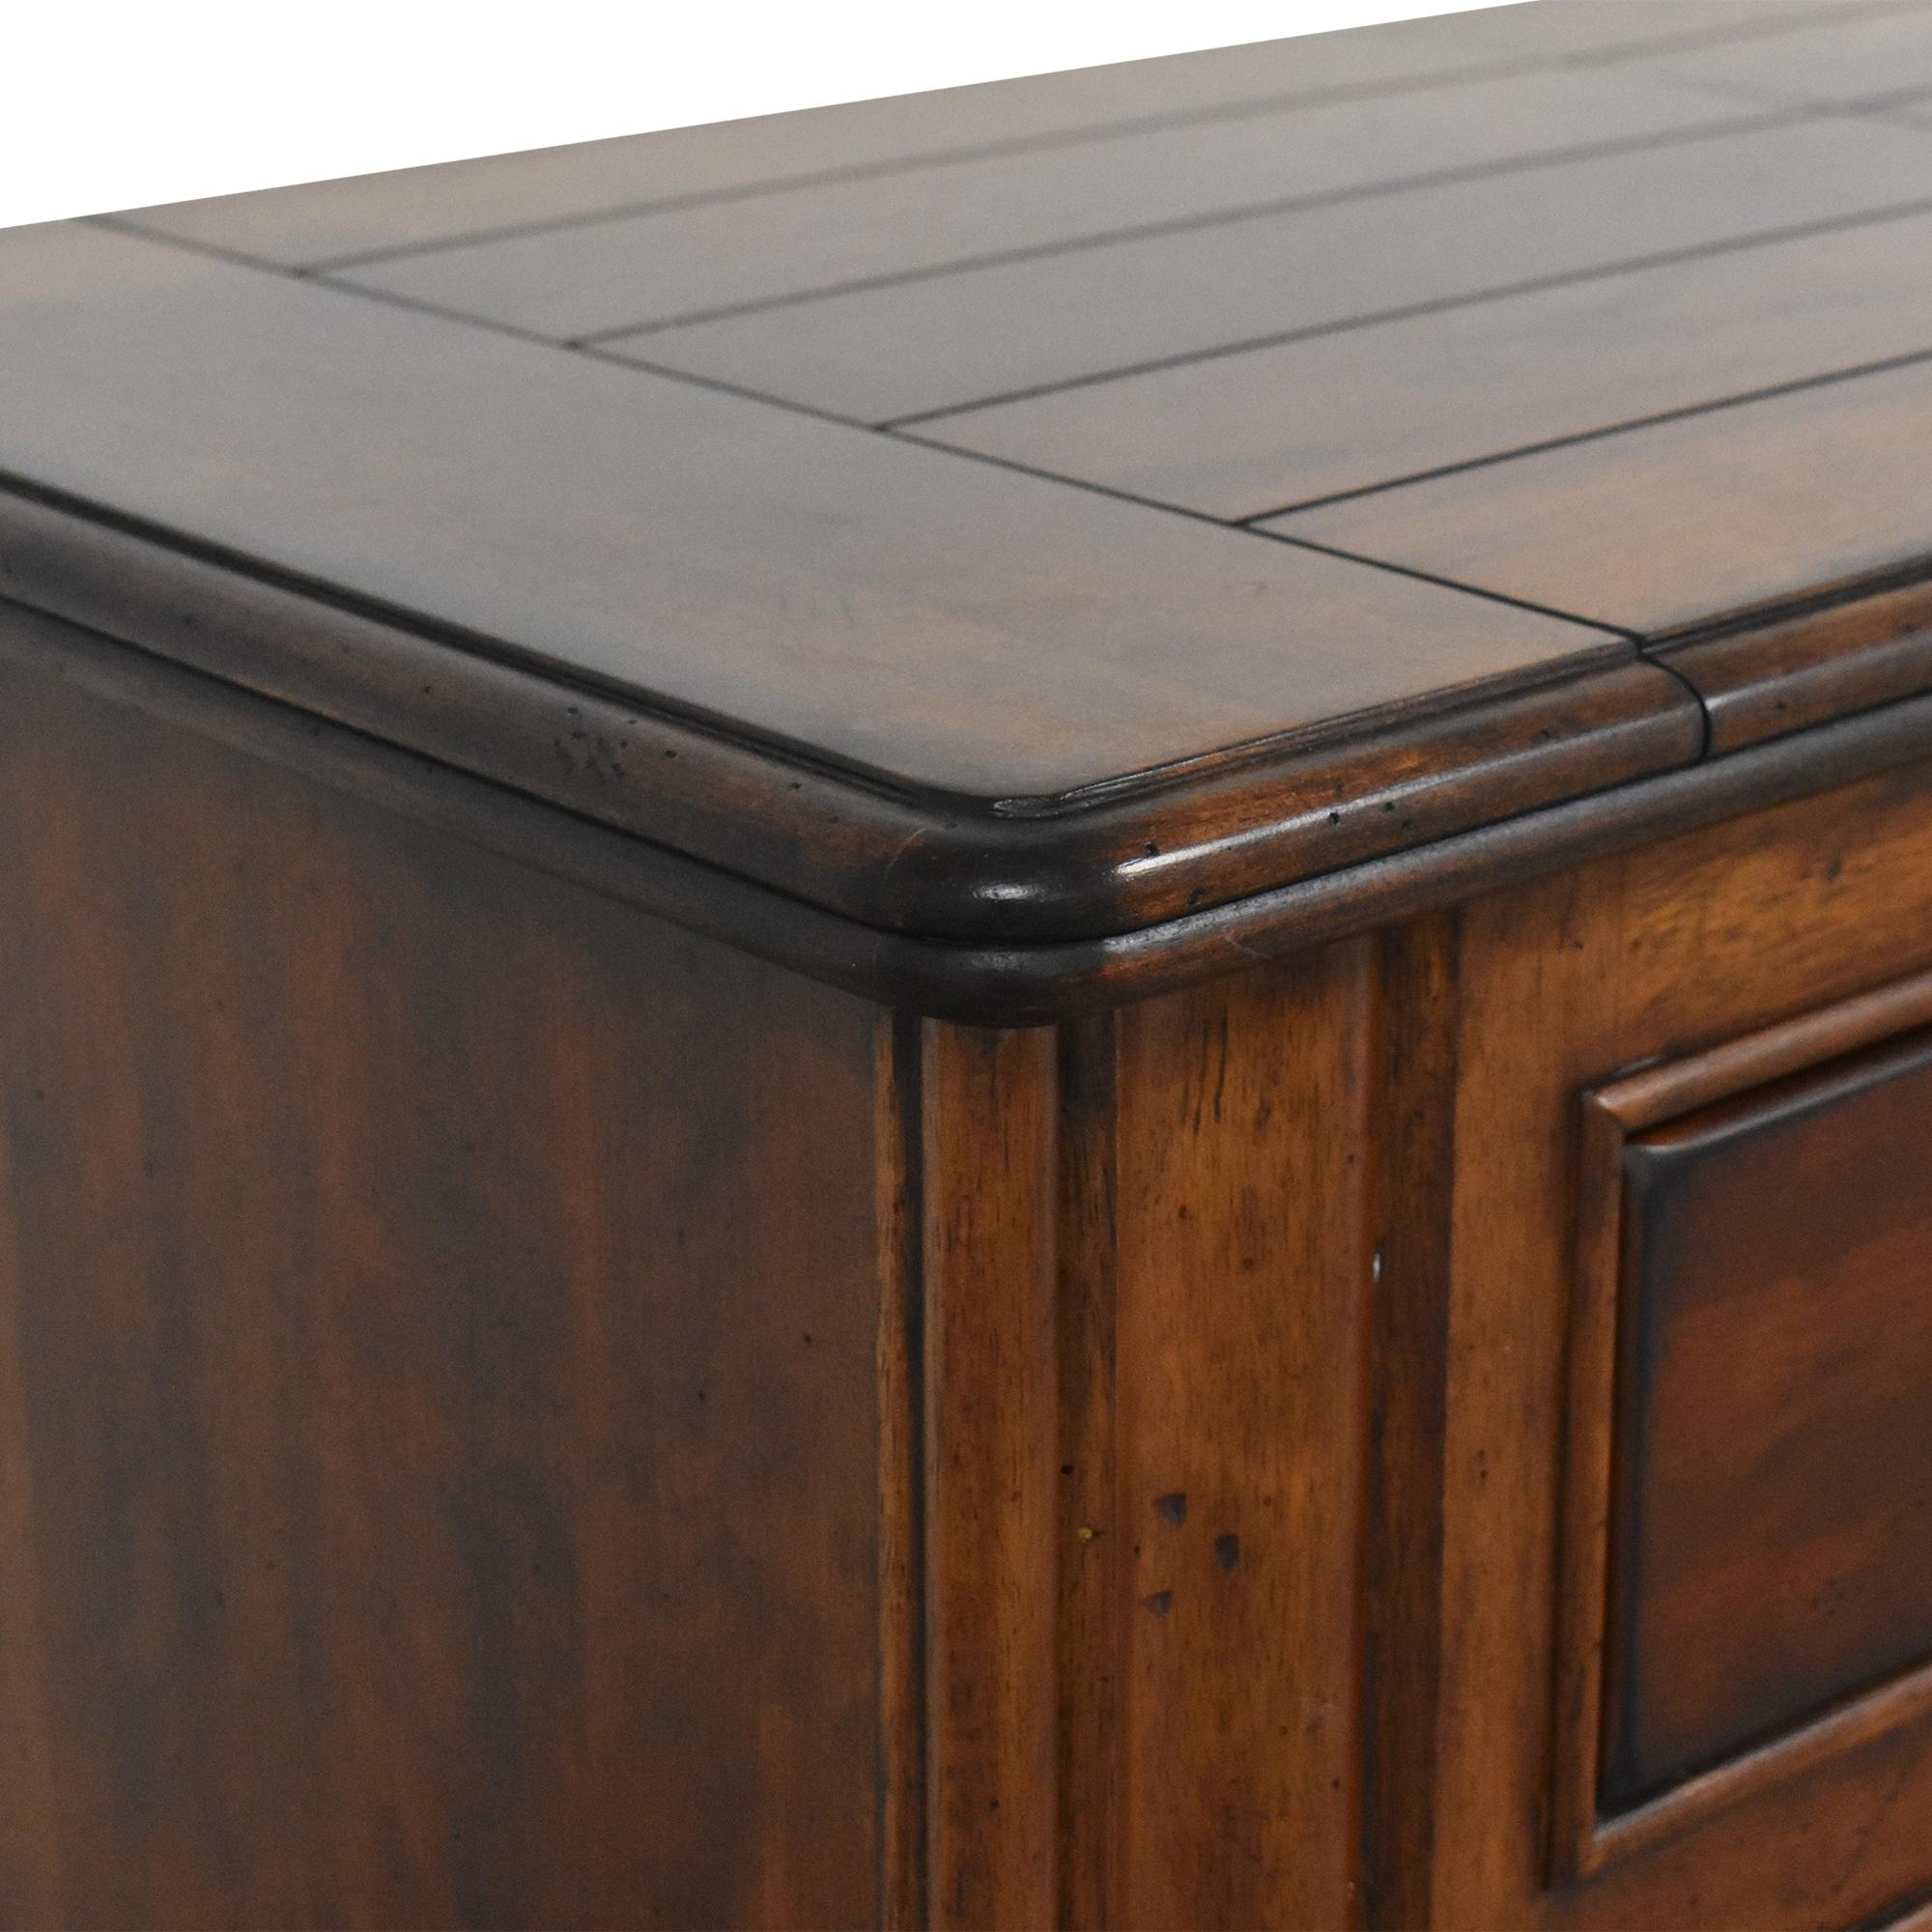 Universal Furniture Universal Furniture Flip Top Server Buffet for sale